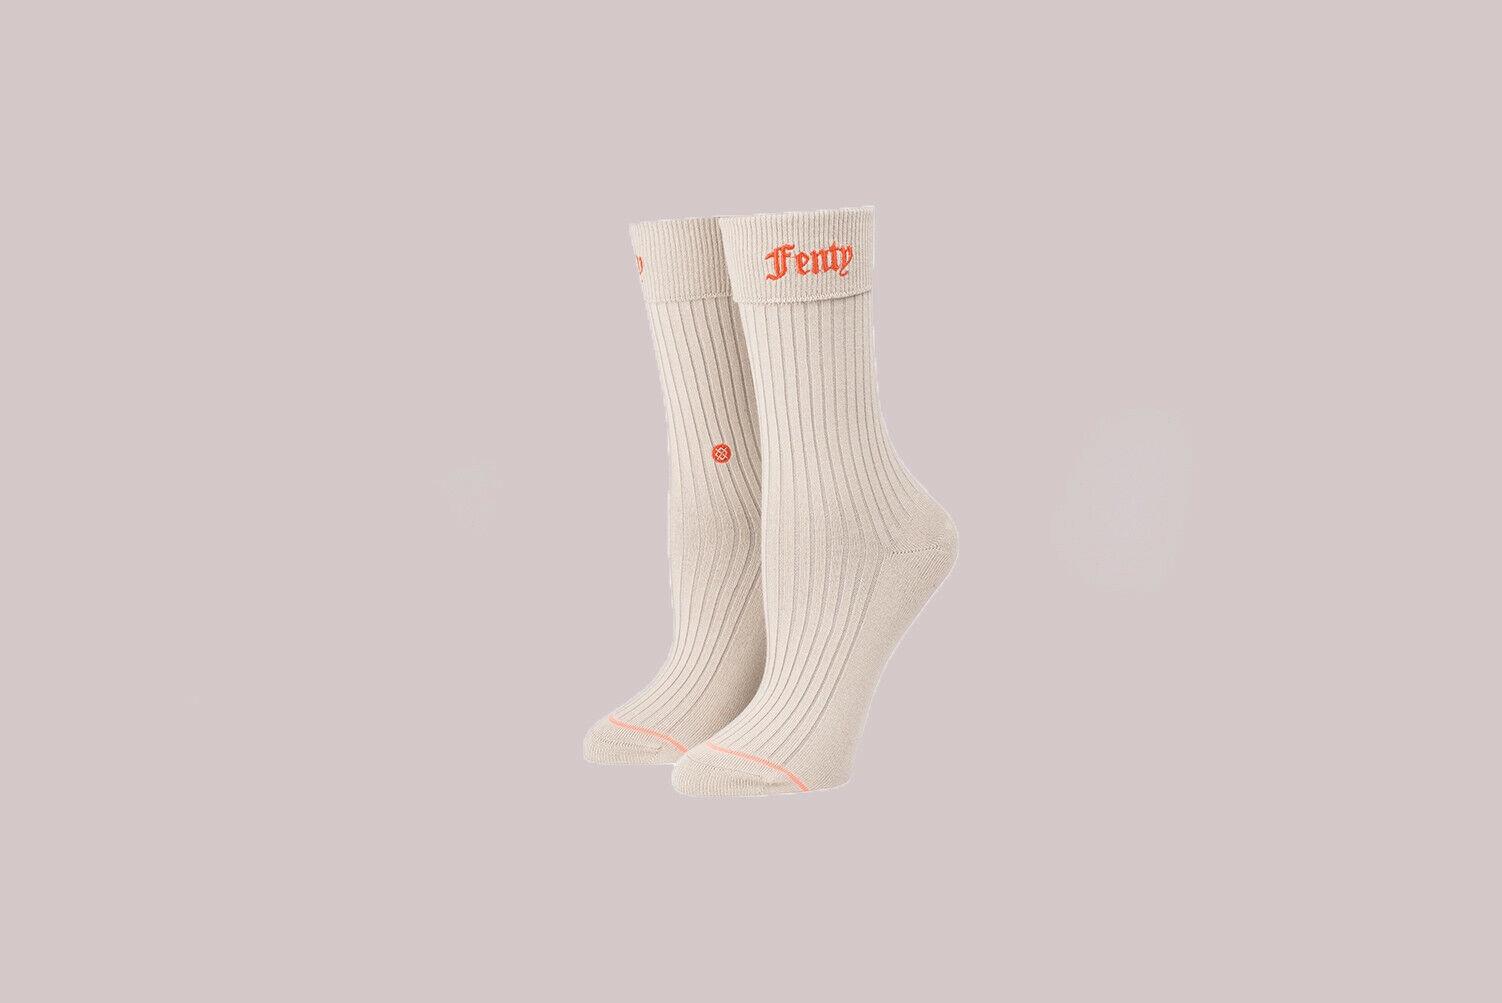 STANCE x Rihanna Fenty Prep Womens Socks Socken size S (EUR 35-37) NEU